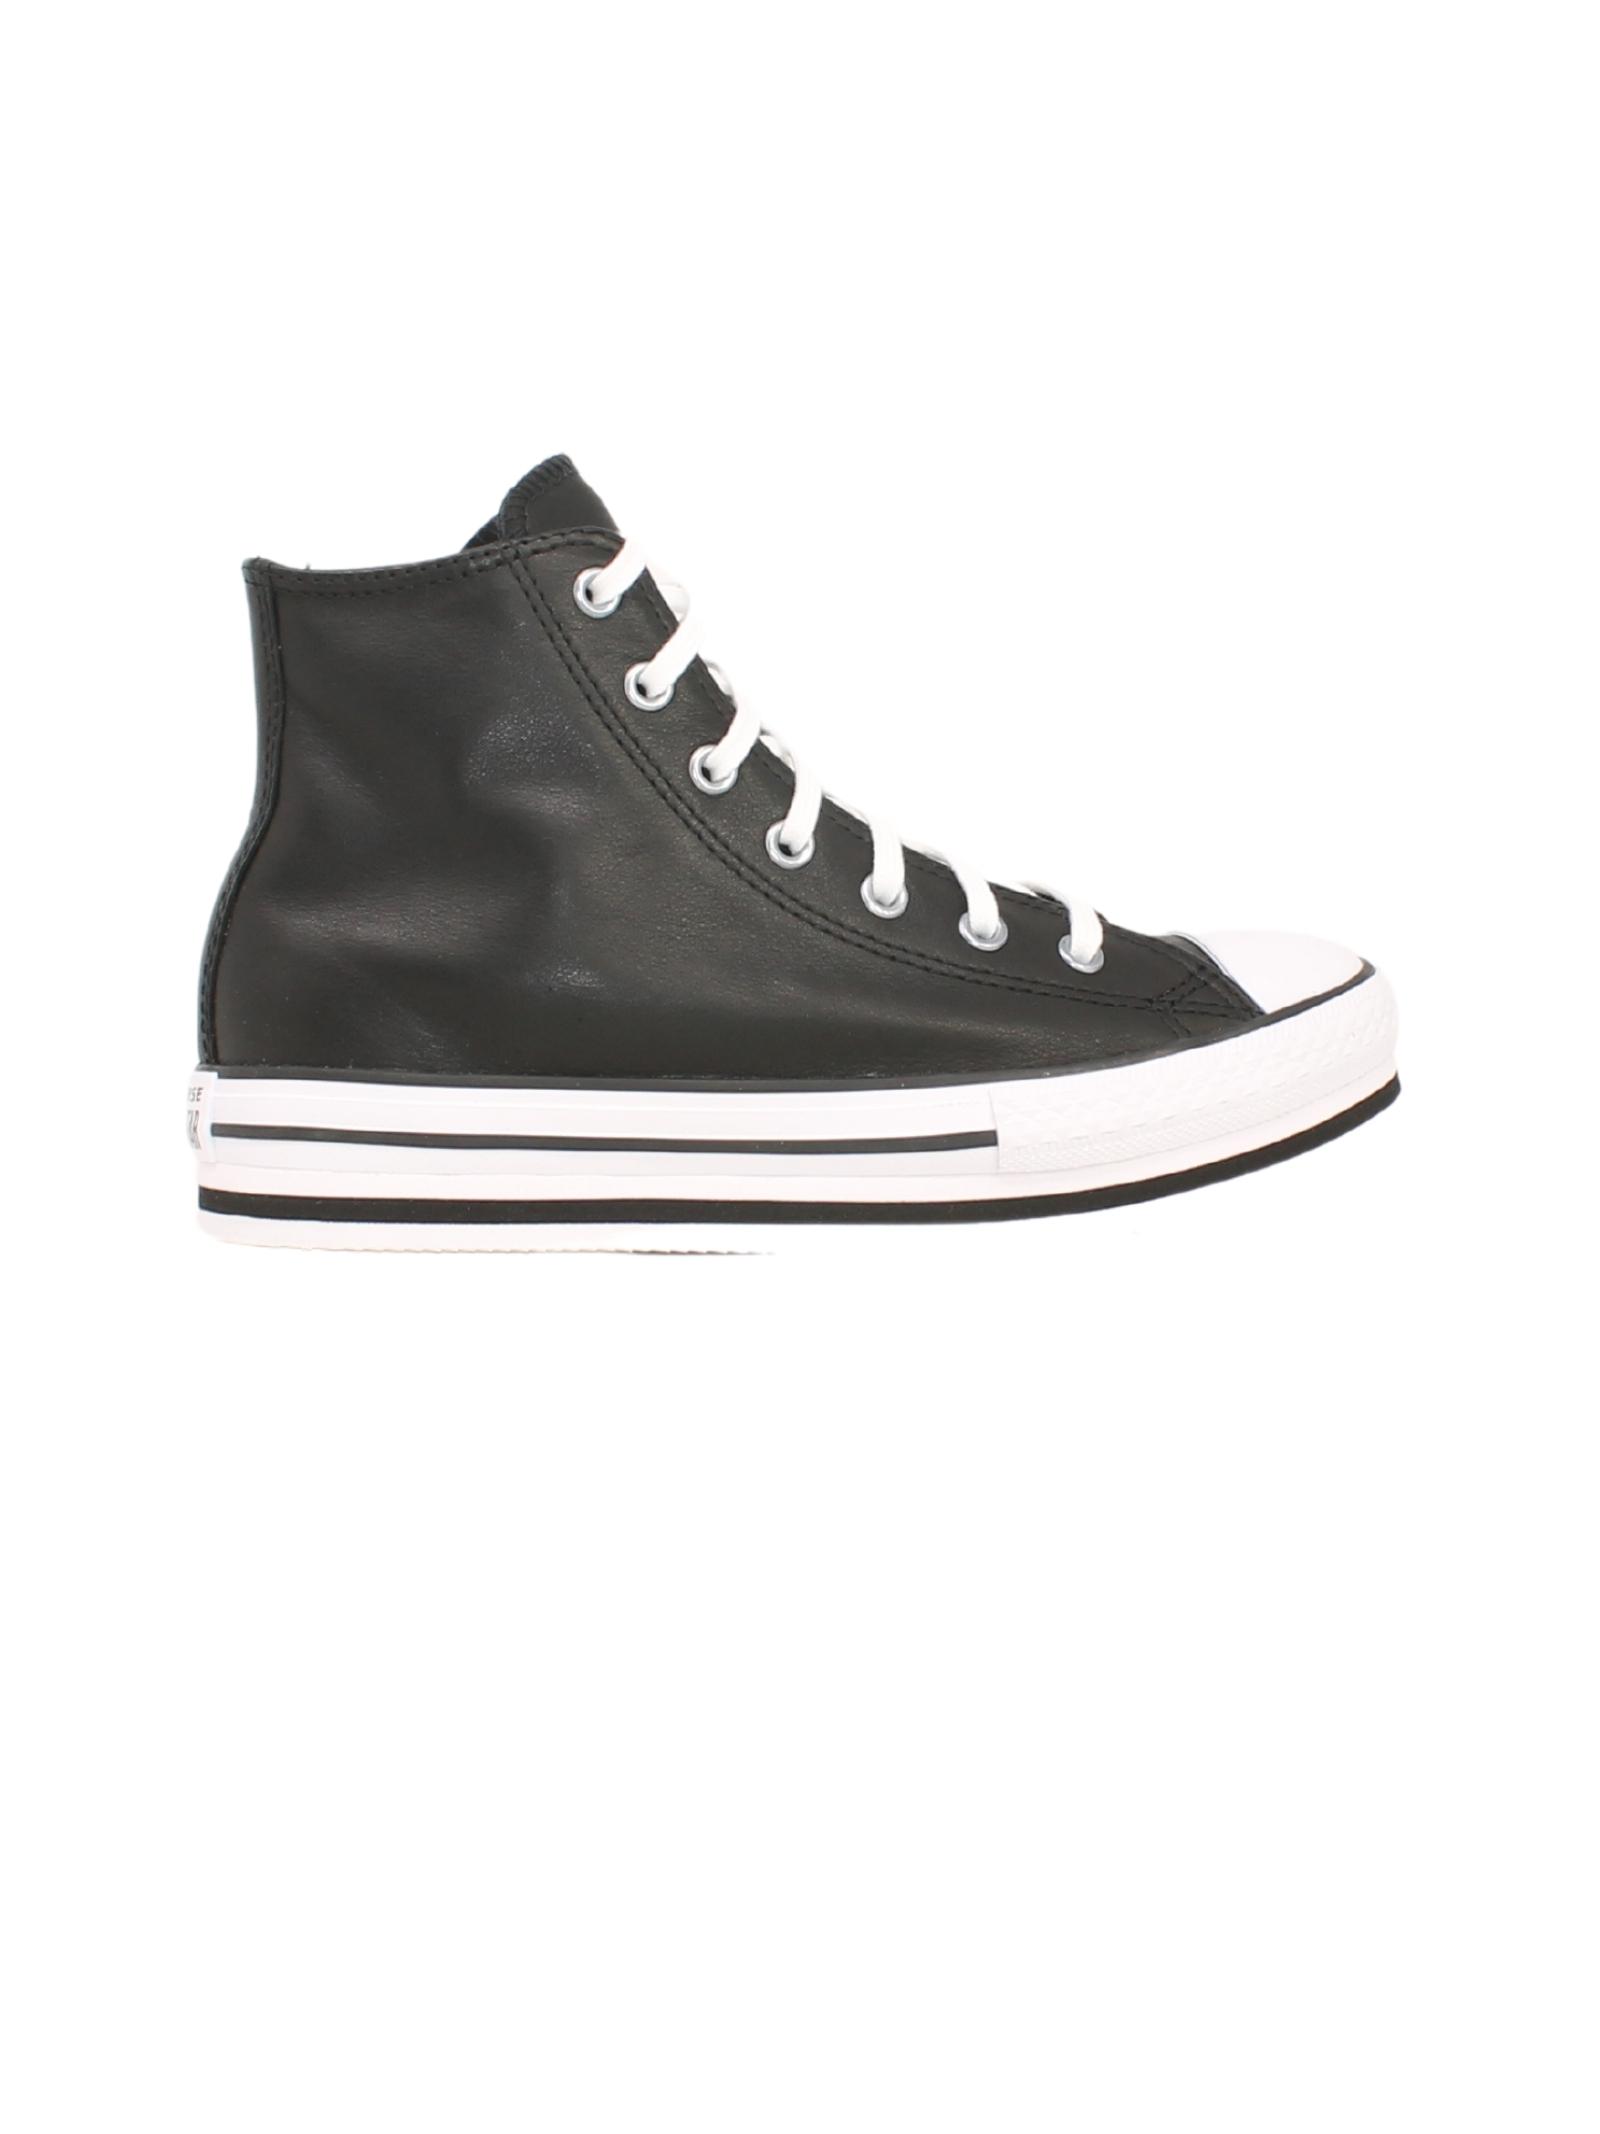 High Sneakers Black White Girl CONVERSE KIDS | Sneakers | 666391CNERO